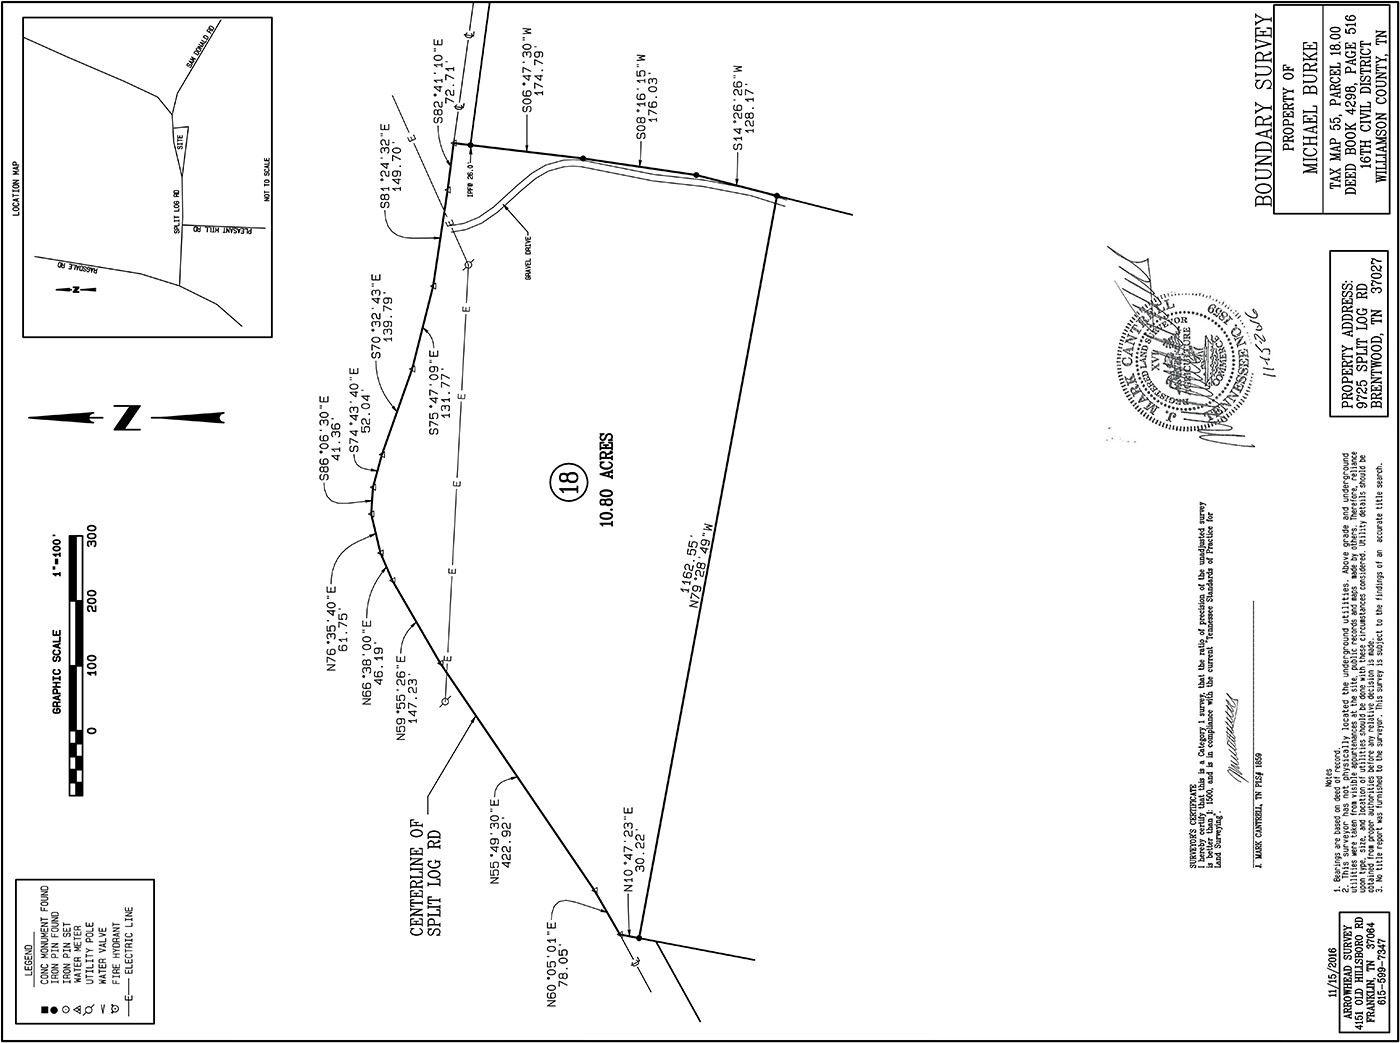 Photo of 9725 Split Log Rd, Brentwood, TN 37027 (MLS # 2001154)